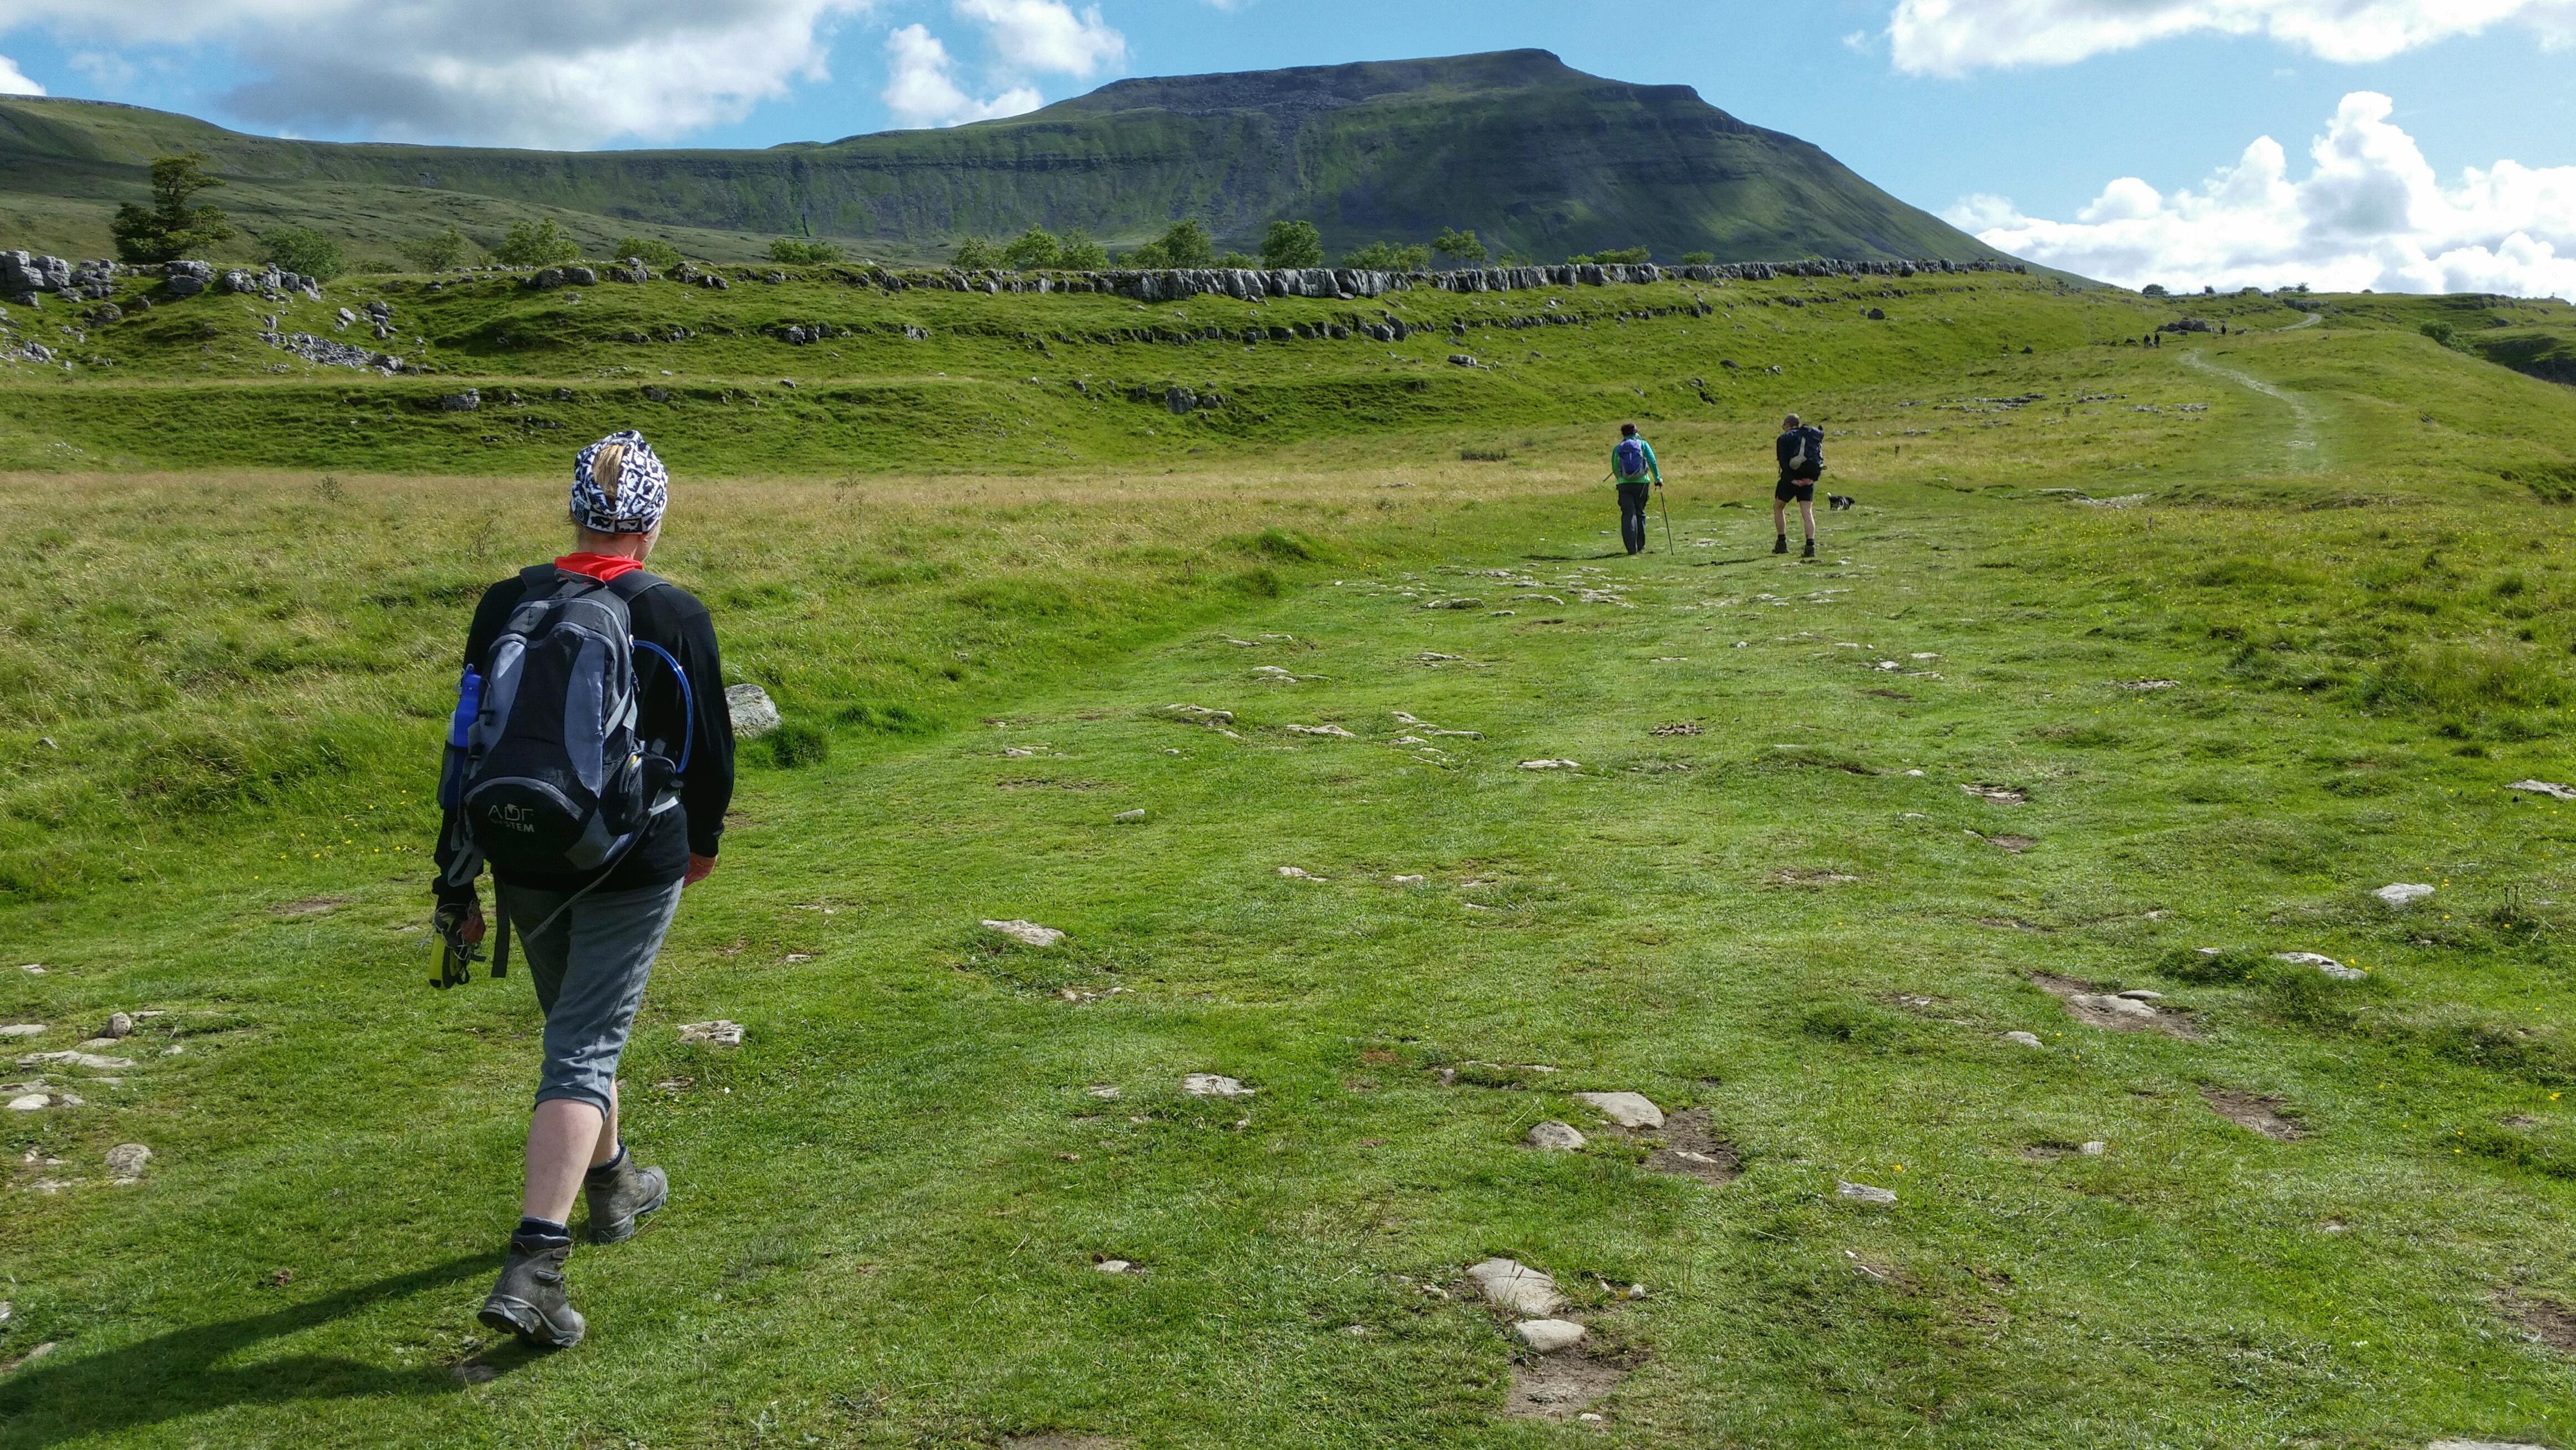 Yorkshire 3 Peaks Ingleborough